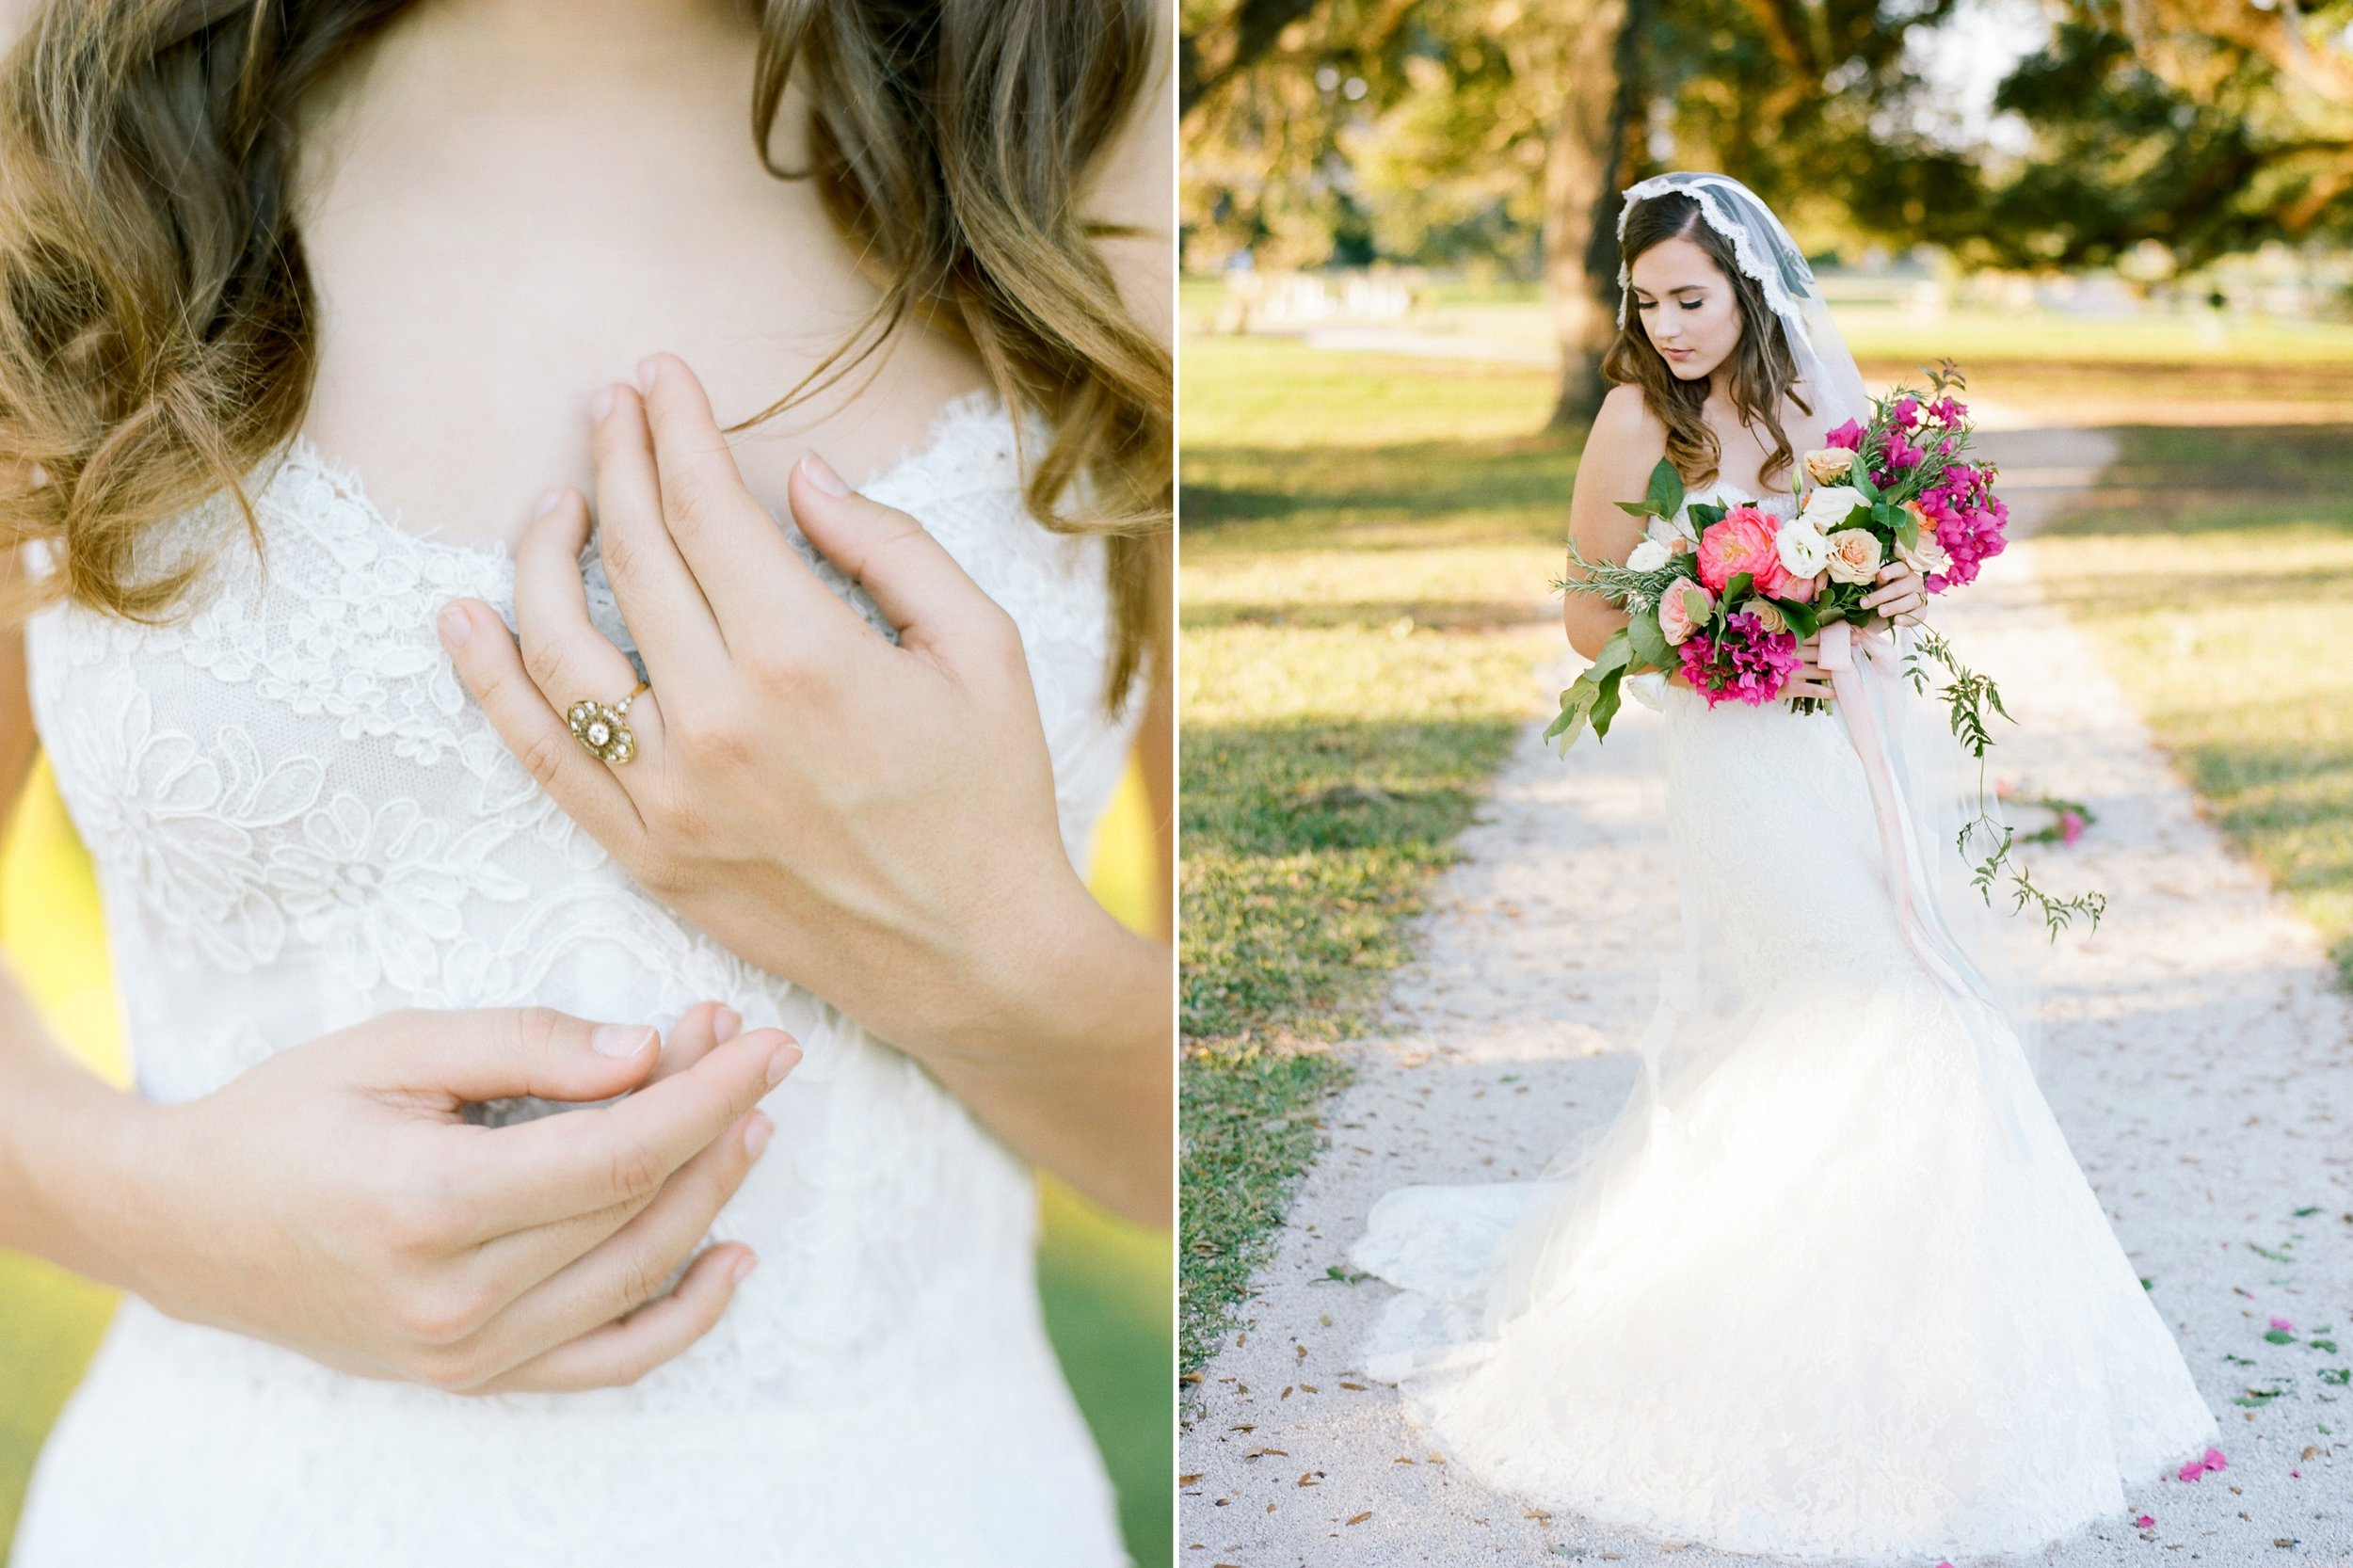 the-clubs-at-houston-oaks-wedding-houston-oaks-wedding-ceremony-houston-oaks-chapel-belle-of-the-ball-dana-fernandez-photography-houston-wedding-photographer-luxury-film-fine-art-115.jpg